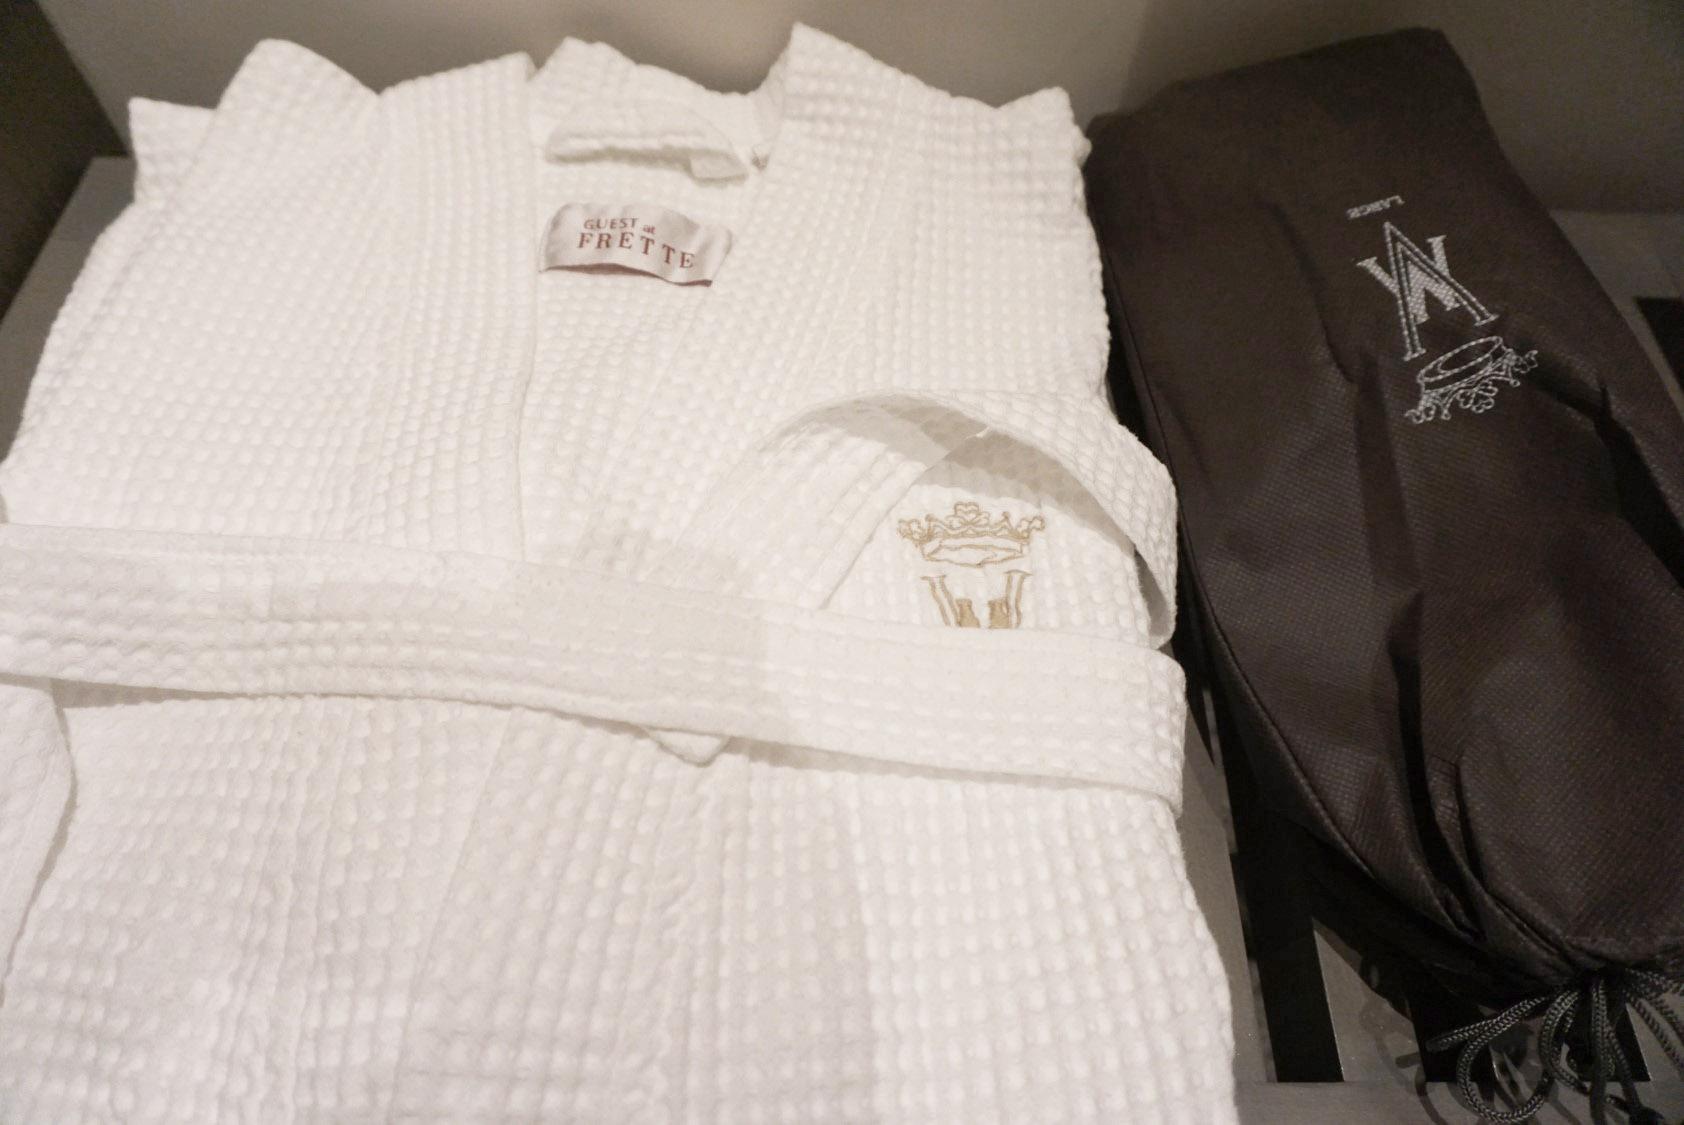 Villa Magna spa, Frette bath robes